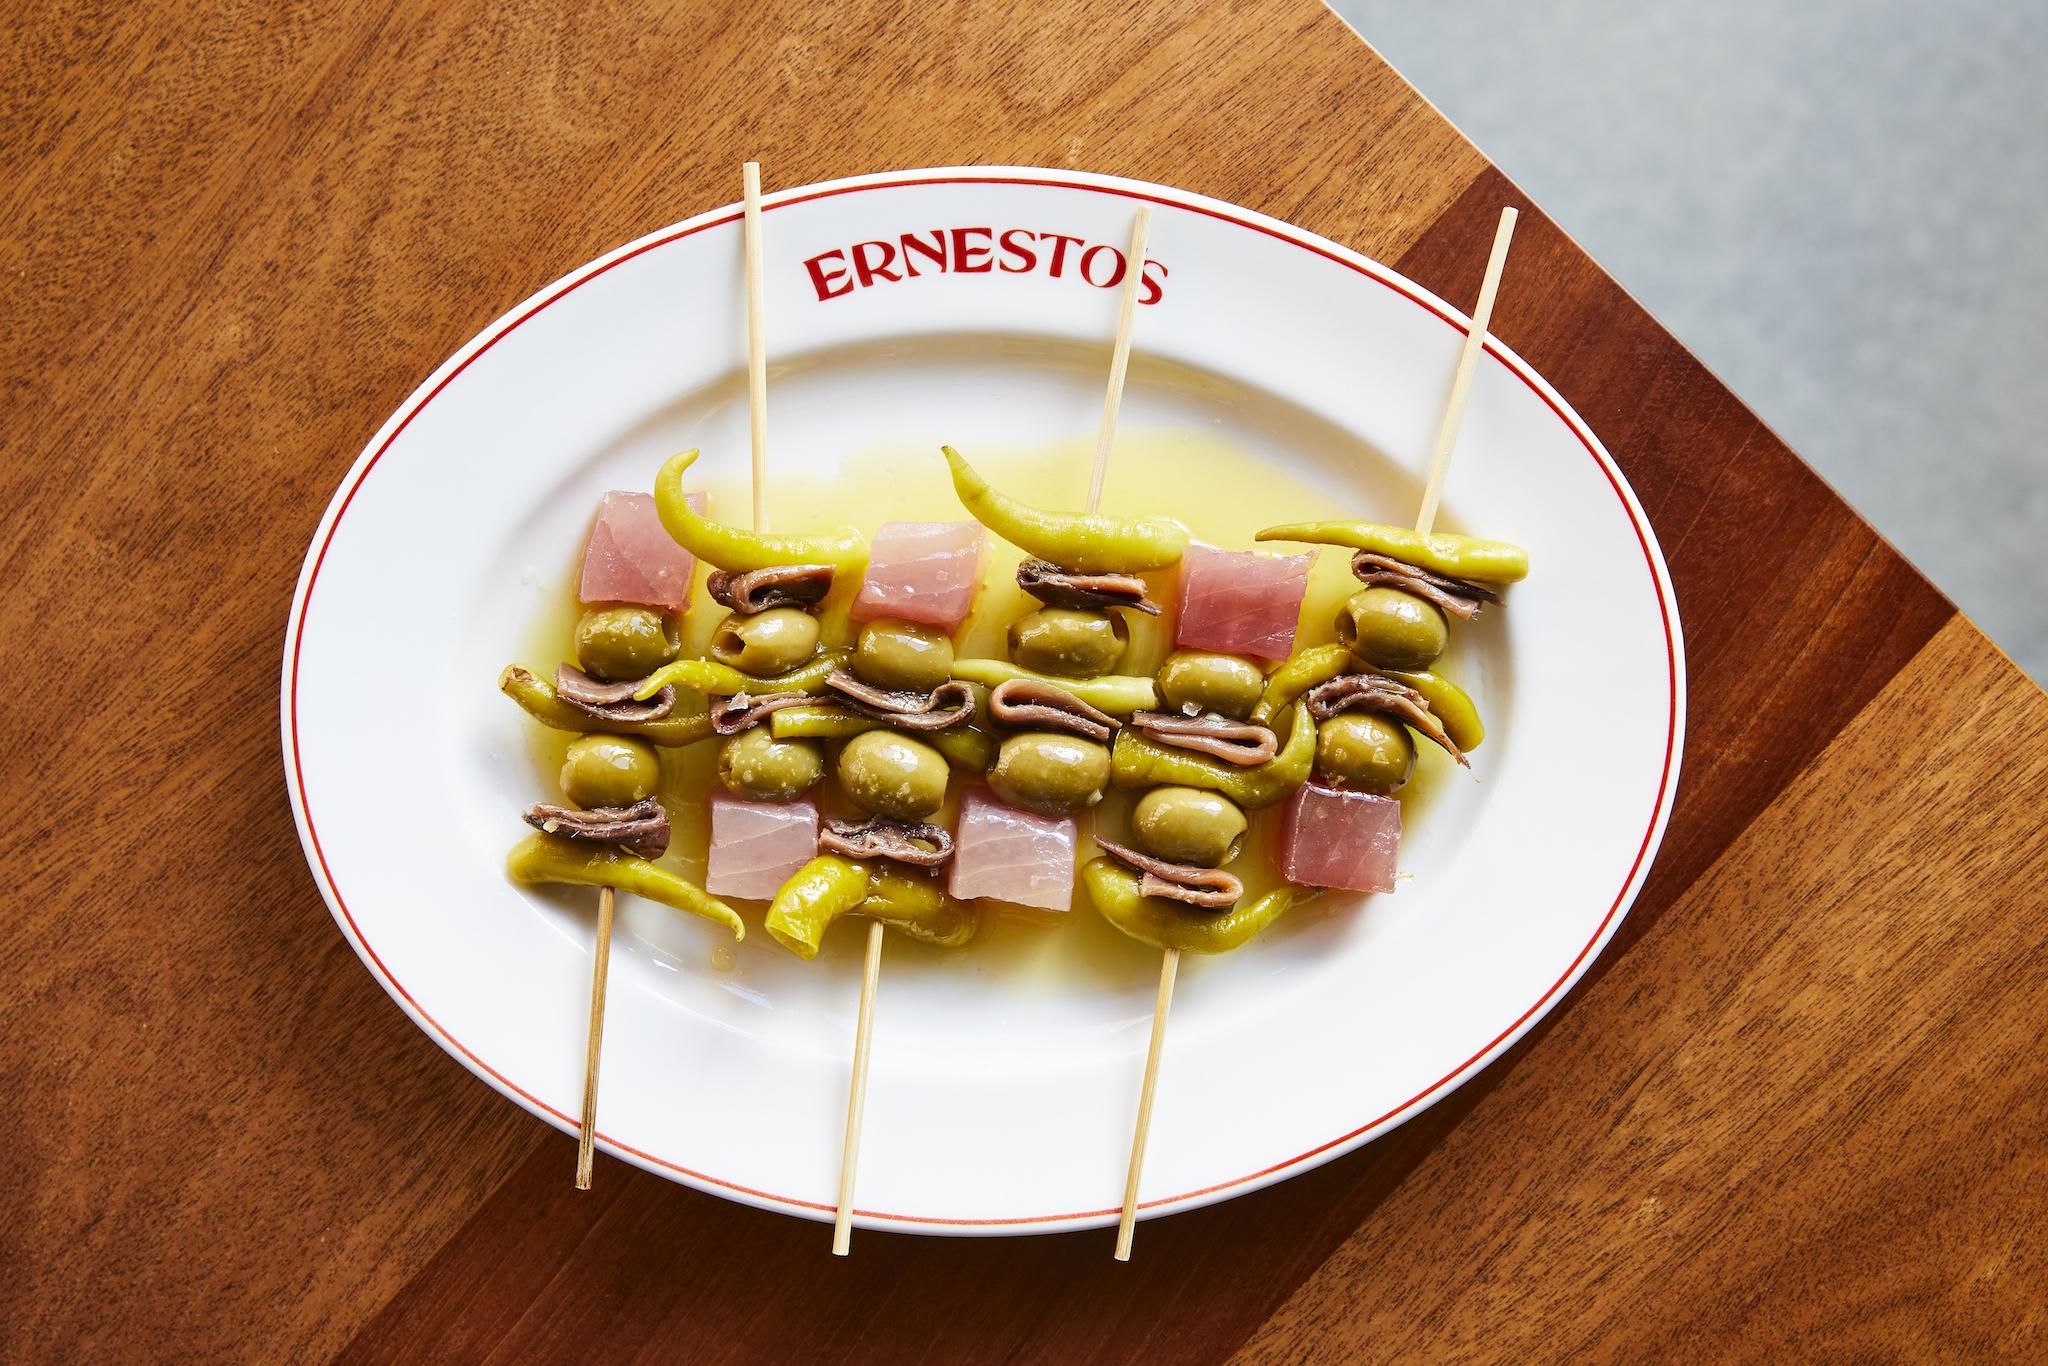 Ernesto's